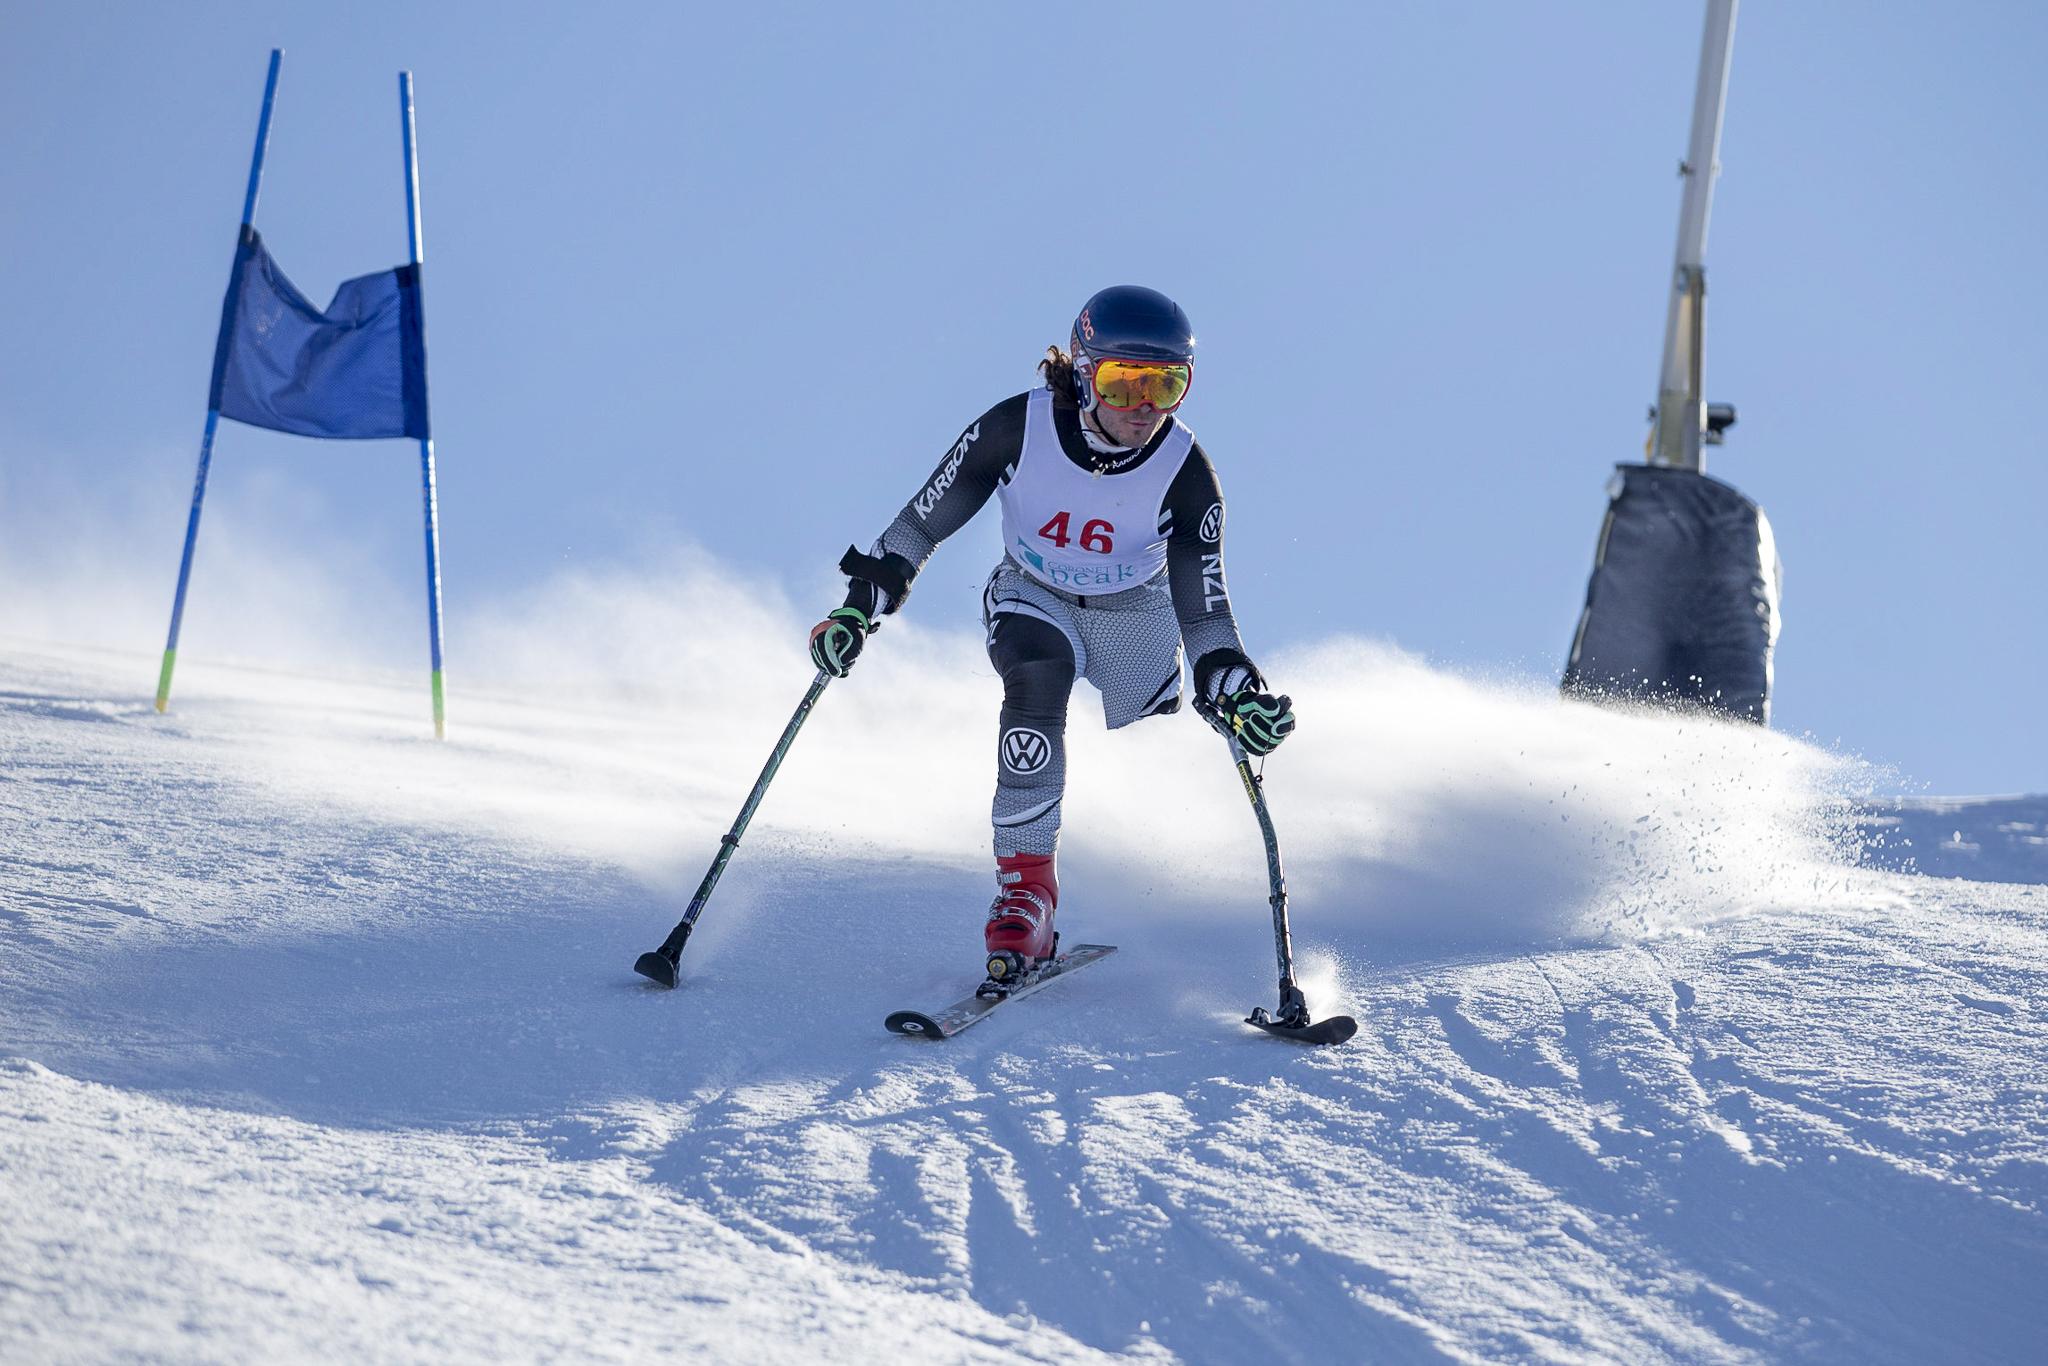 ski race-1.jpg